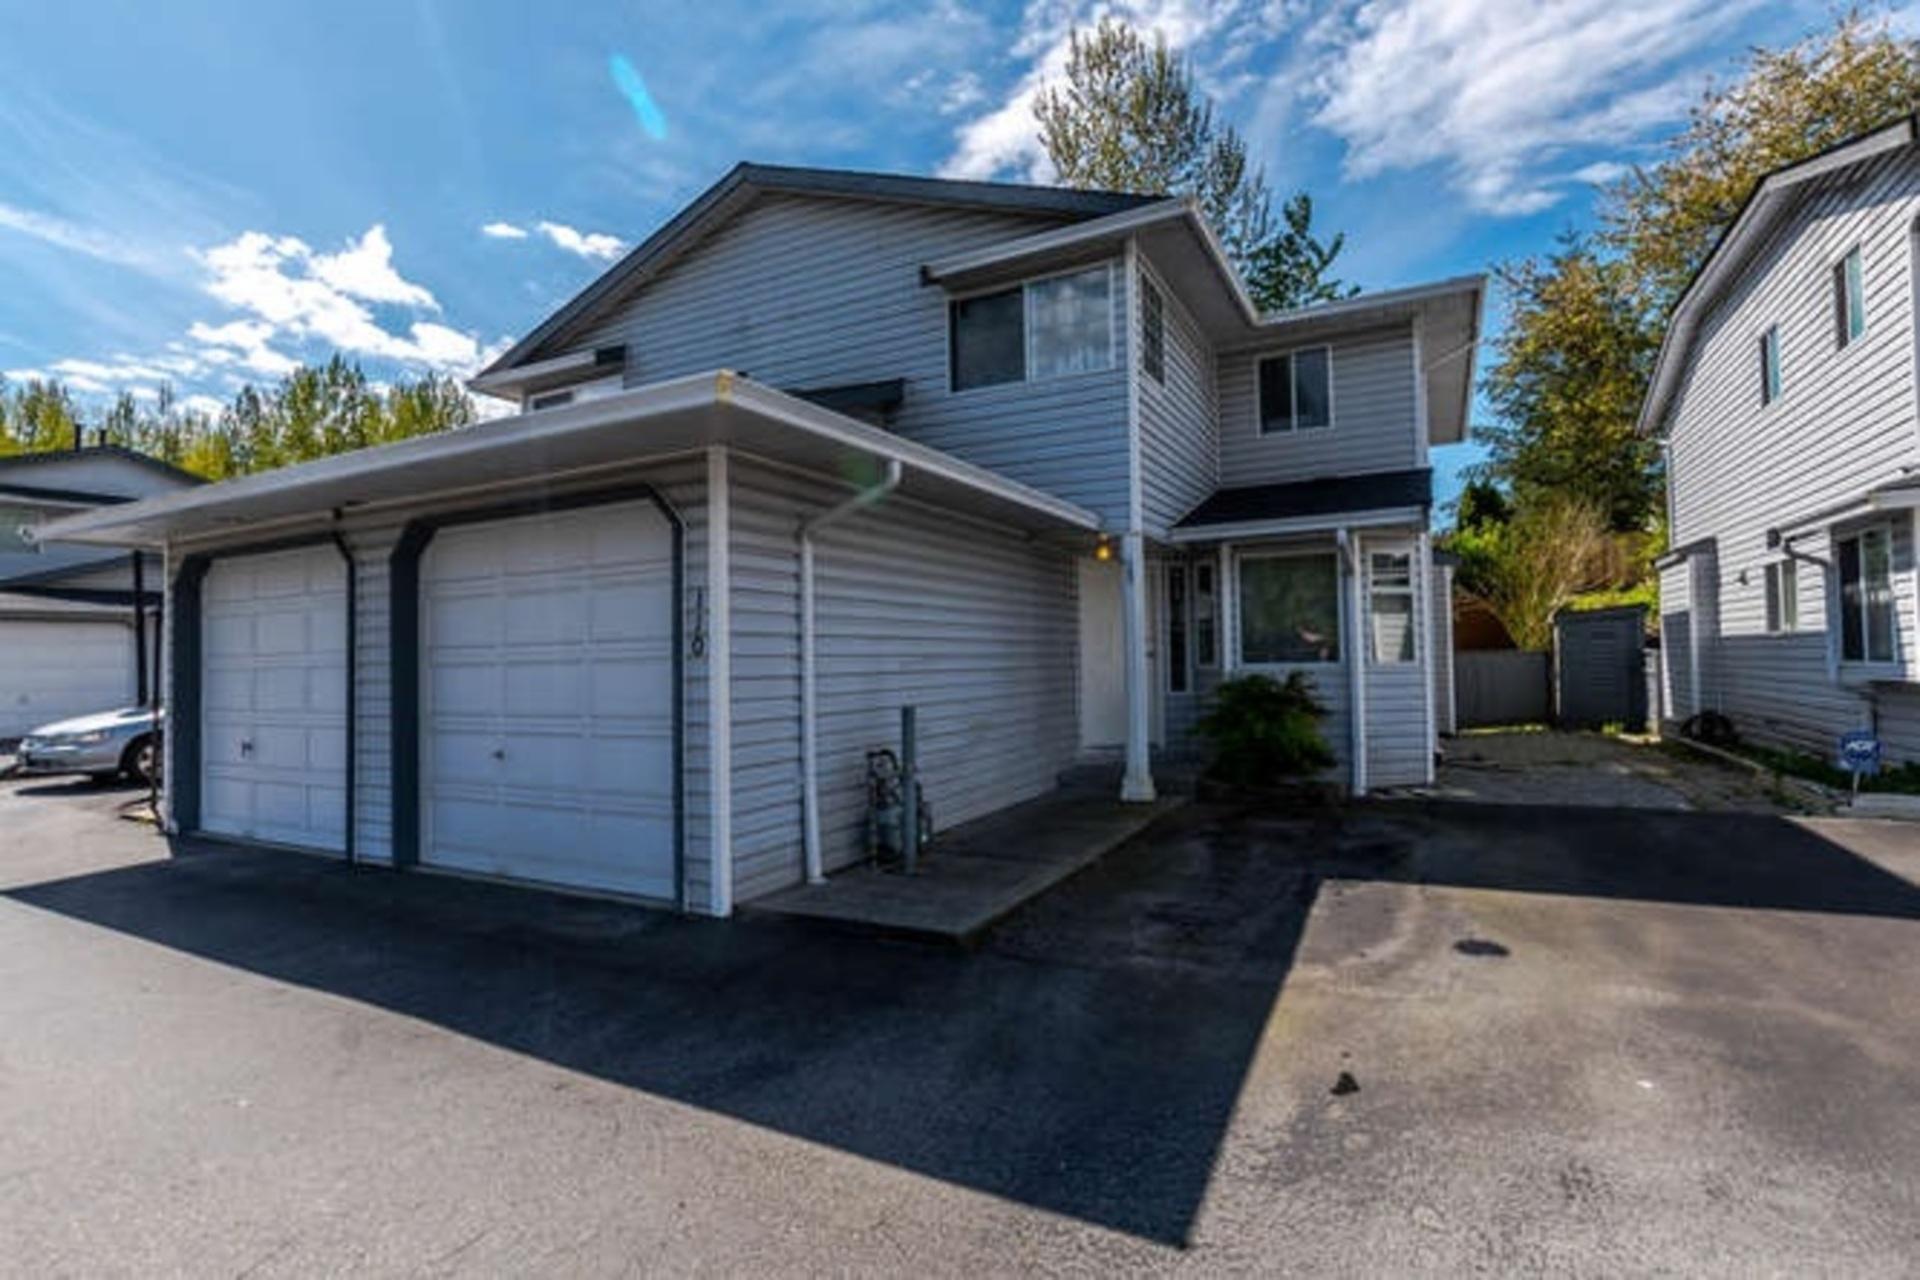 11255-harrison-street-east-central-maple-ridge-07 at 110 - 11255 Harrison Street, East Central, Maple Ridge